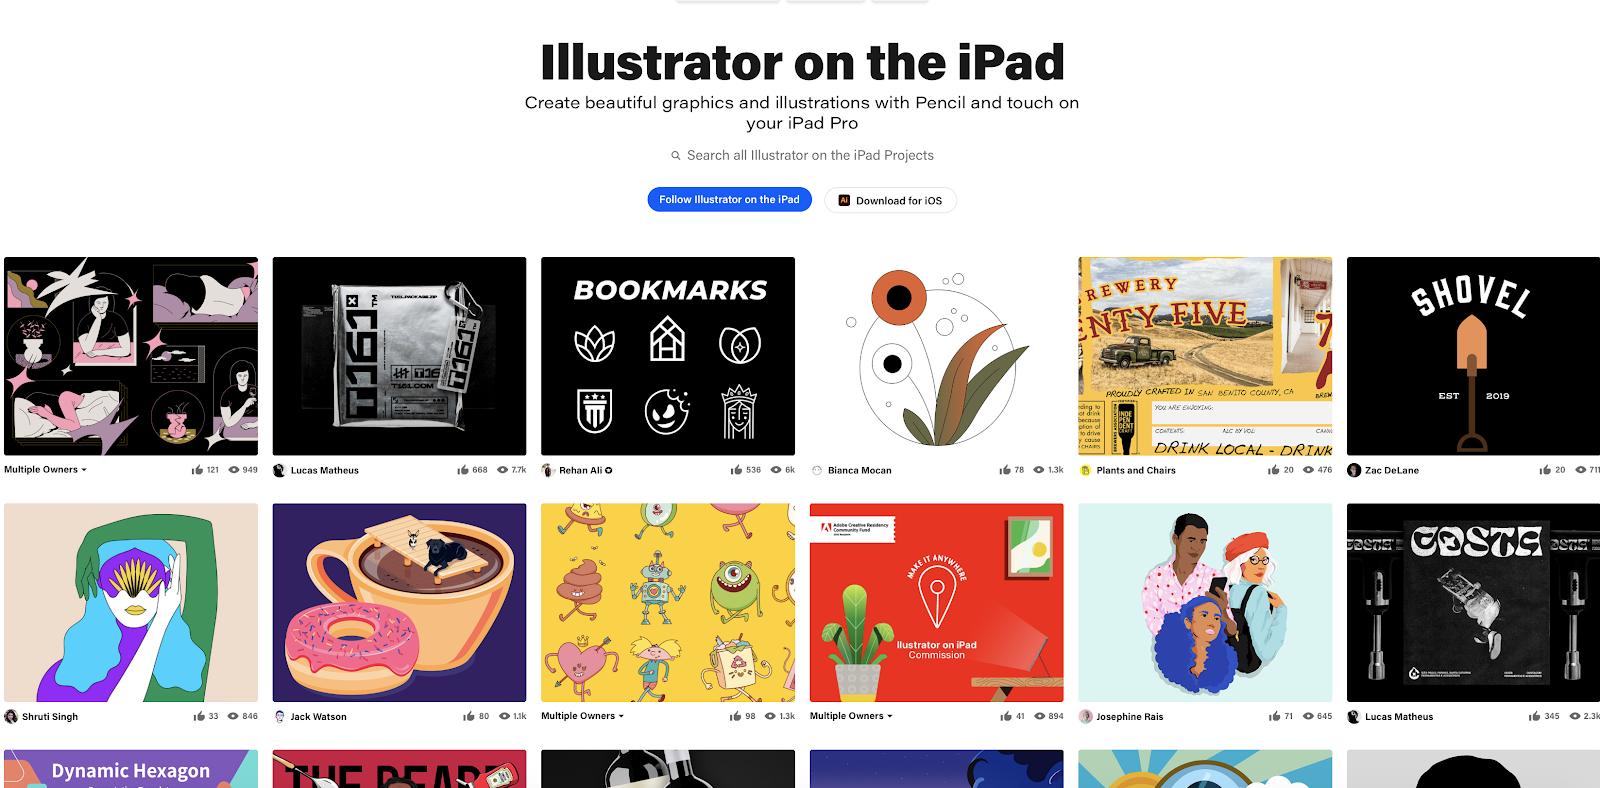 Illustrations from Illustrator on the iPad Beta program participants, featured on Behance.